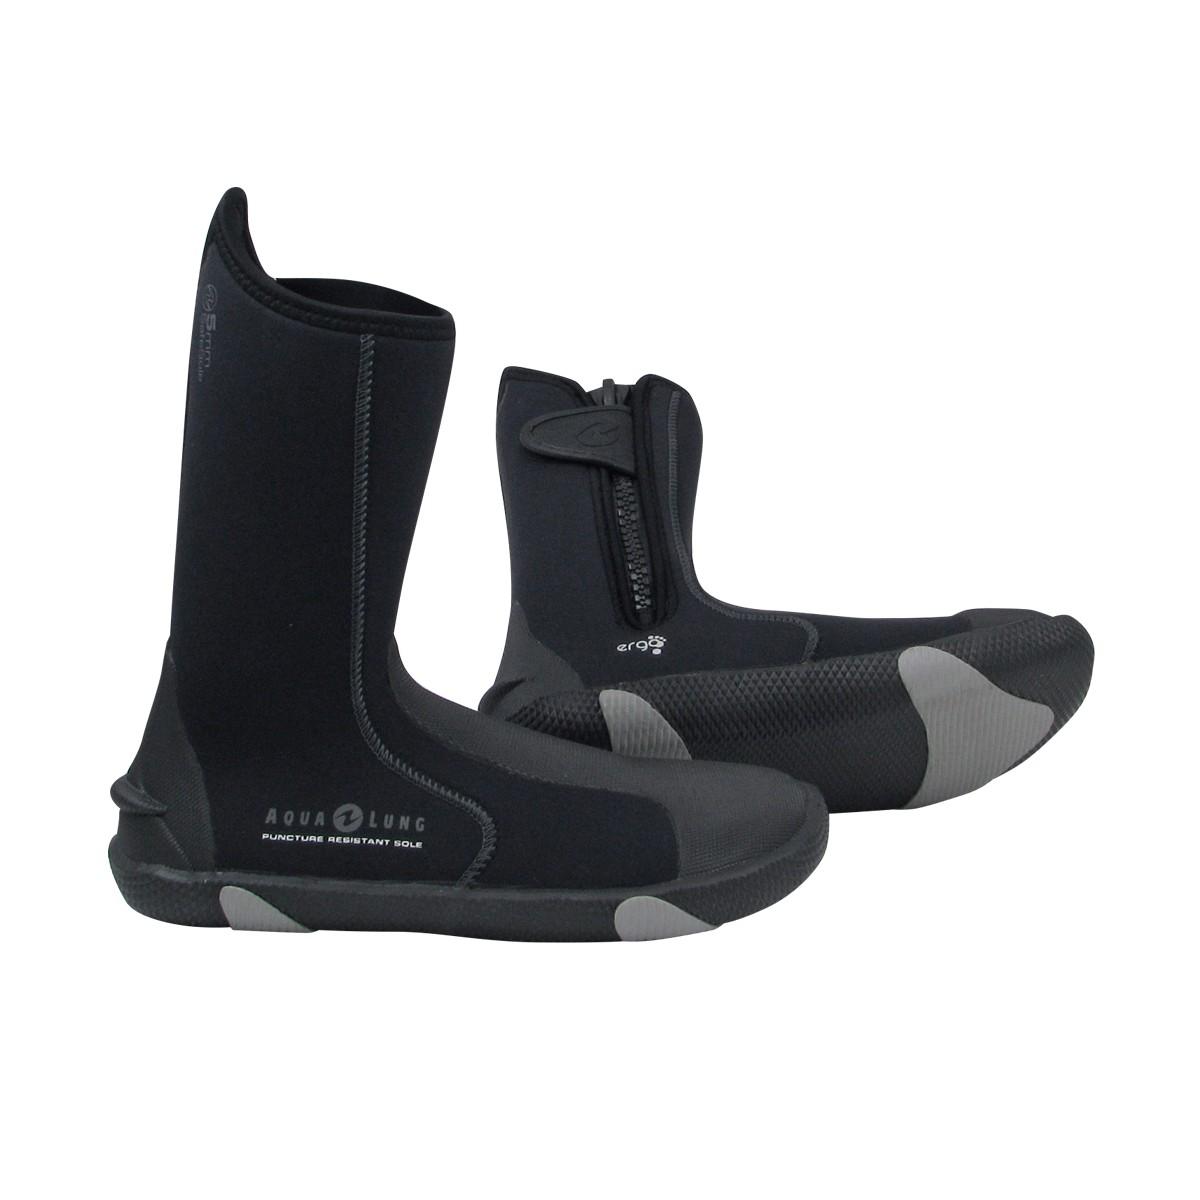 Aqua Lung Men's 5mm Safe Sole Ergo Boot